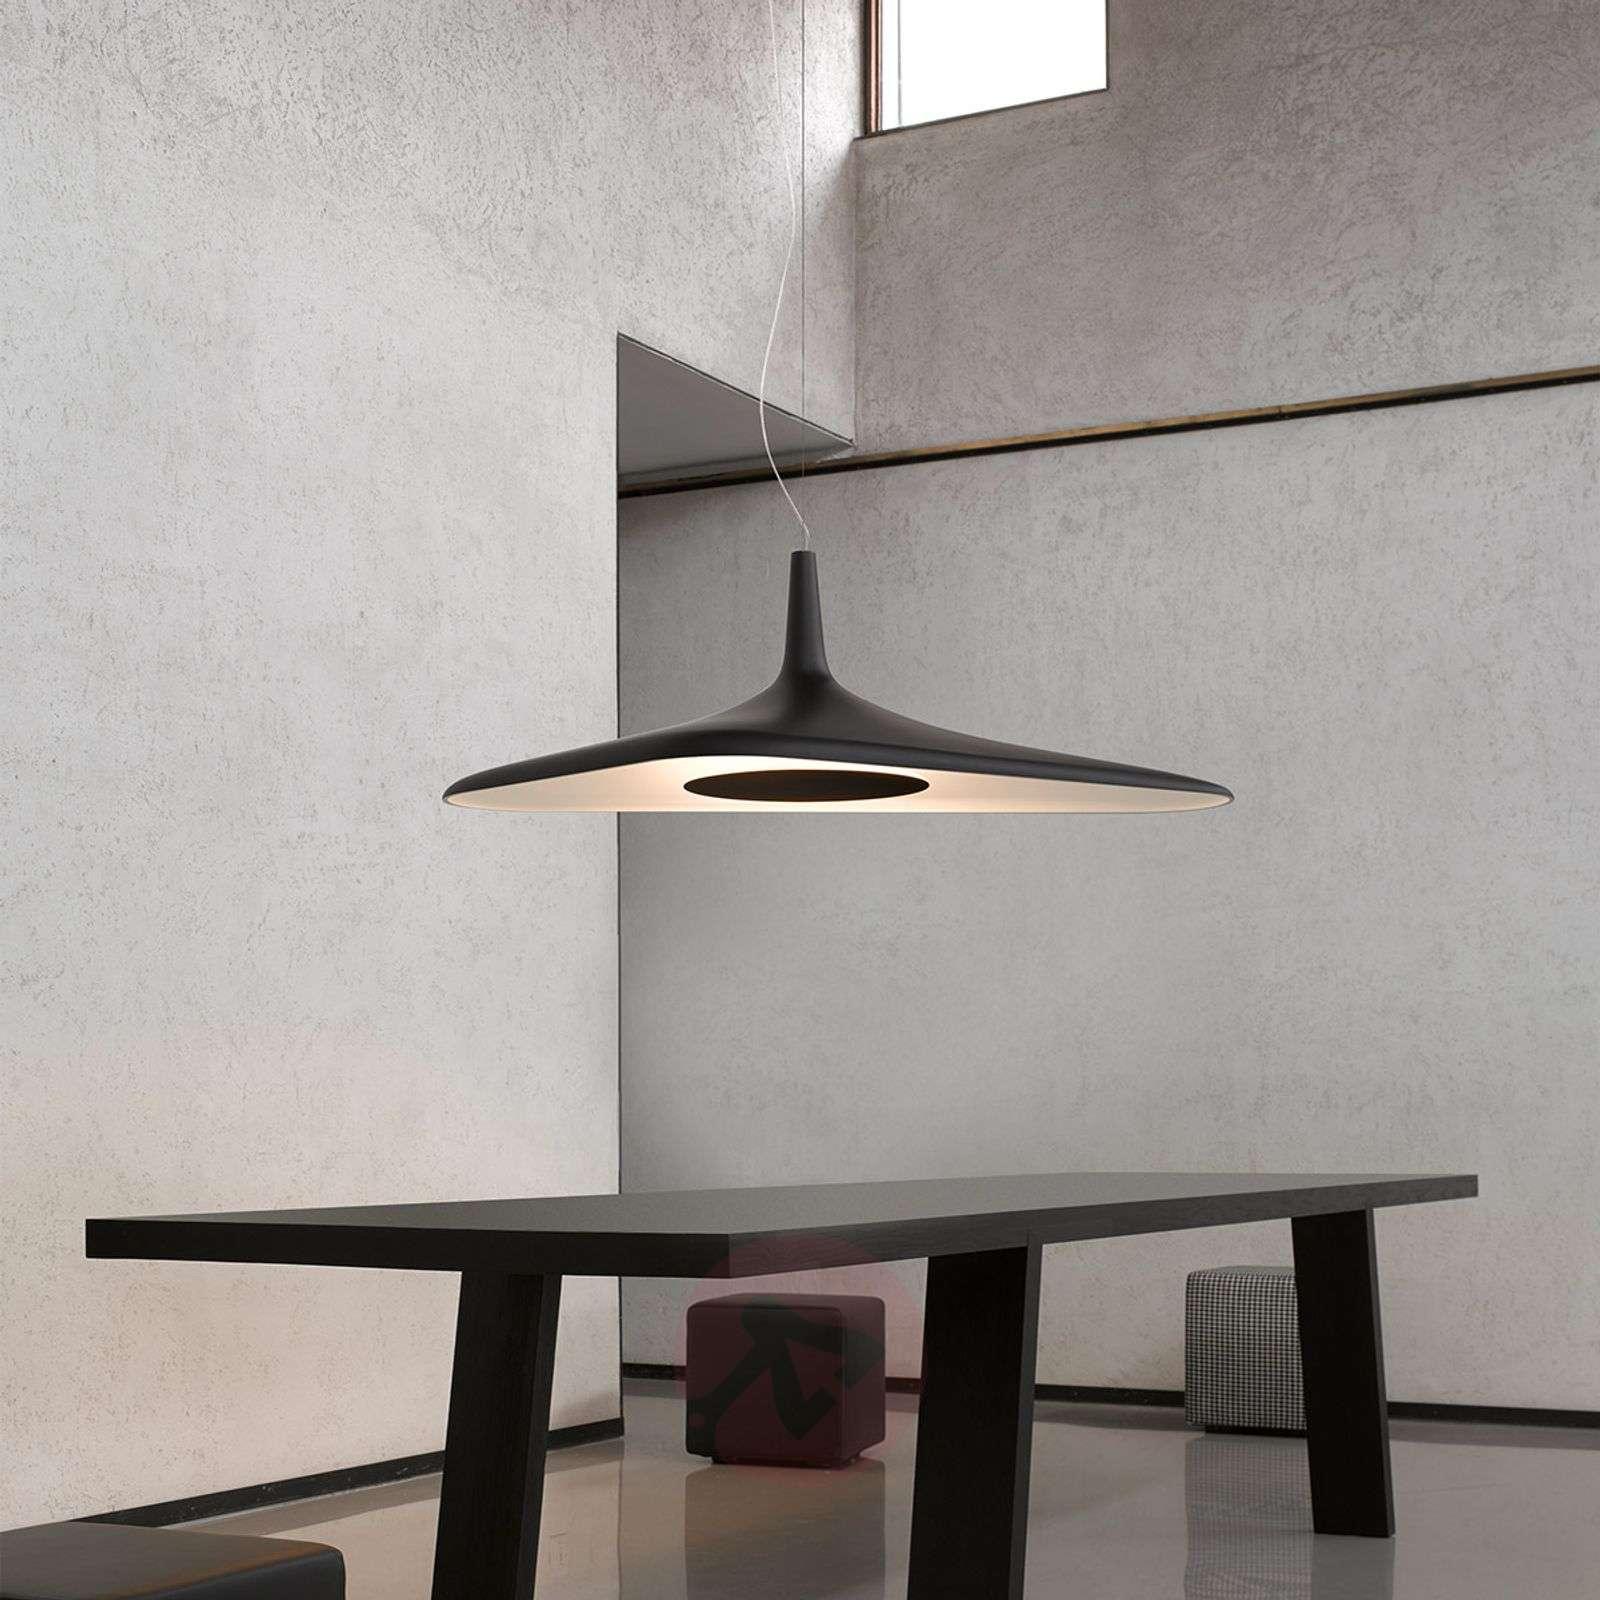 Futuristinen LED-riippuvalaisin Soleil Noir-6030176-02